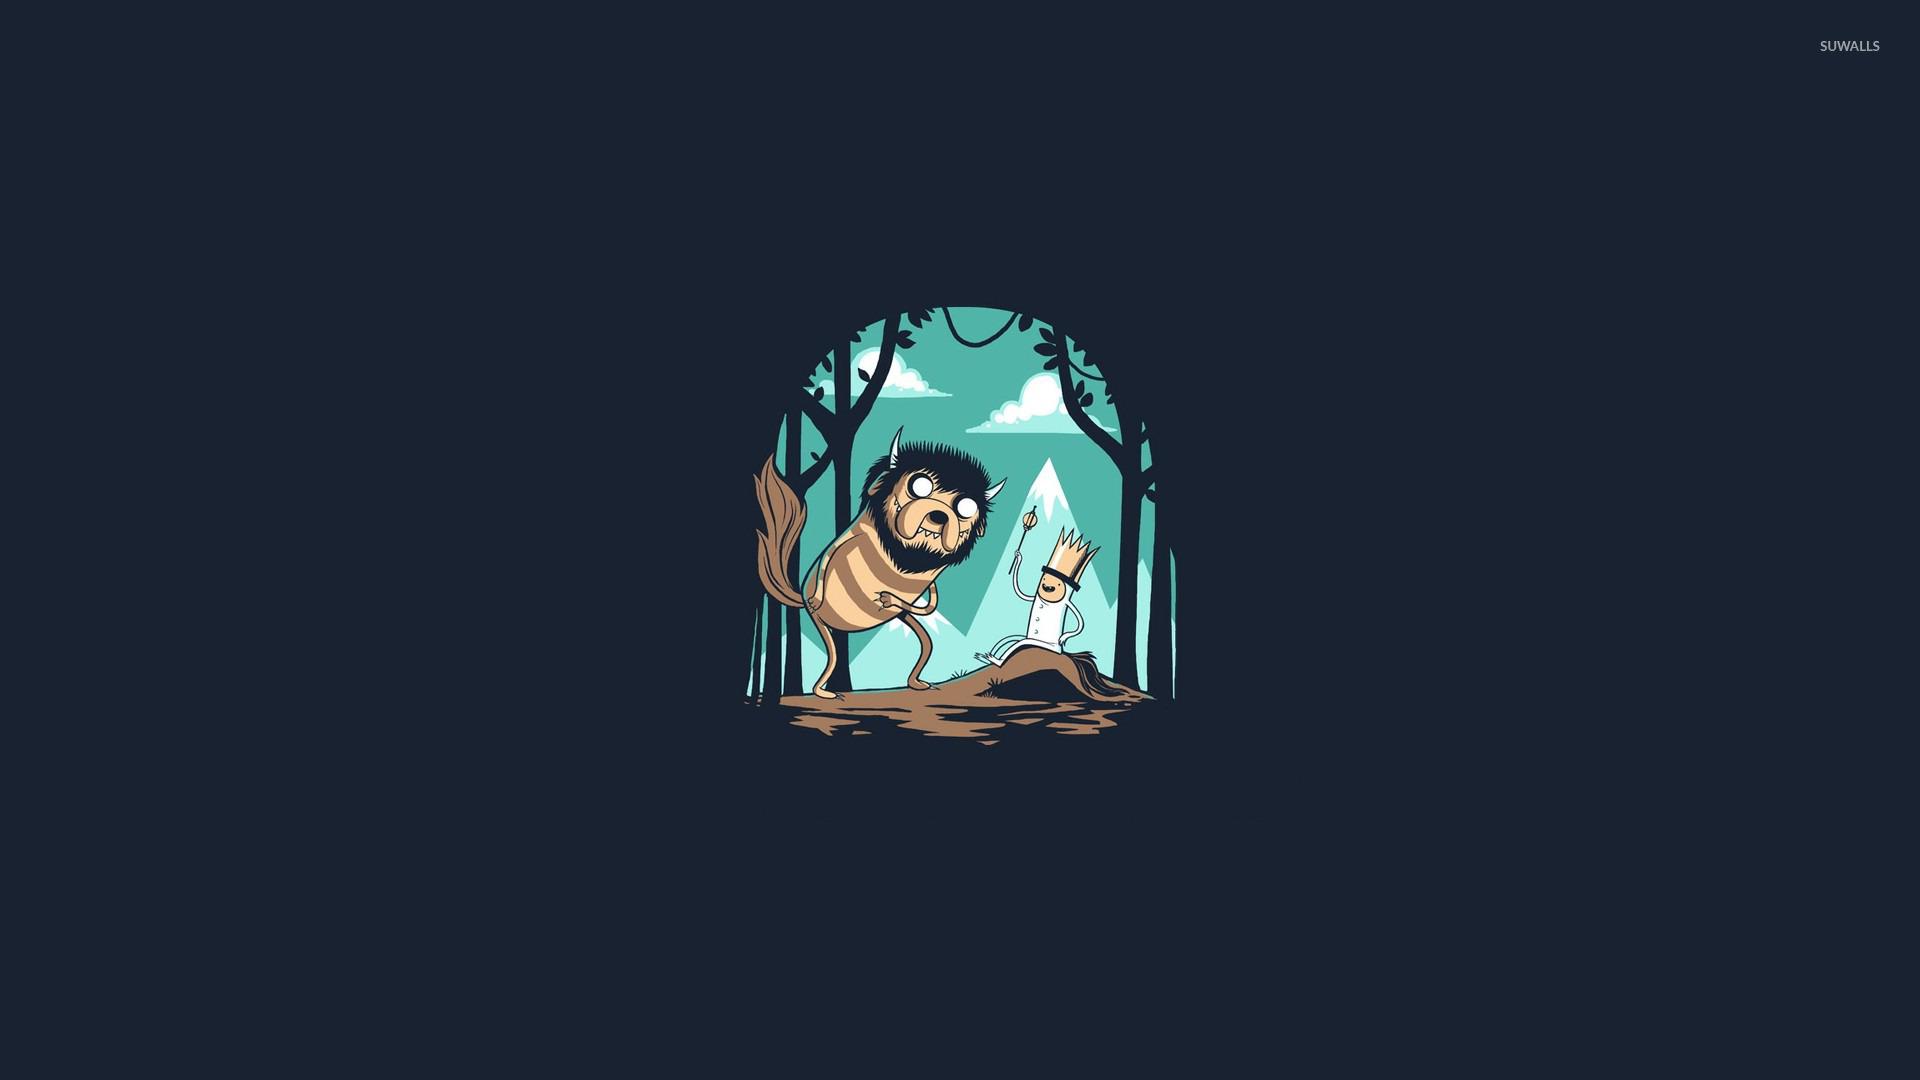 Adventure Time 7 Wallpaper